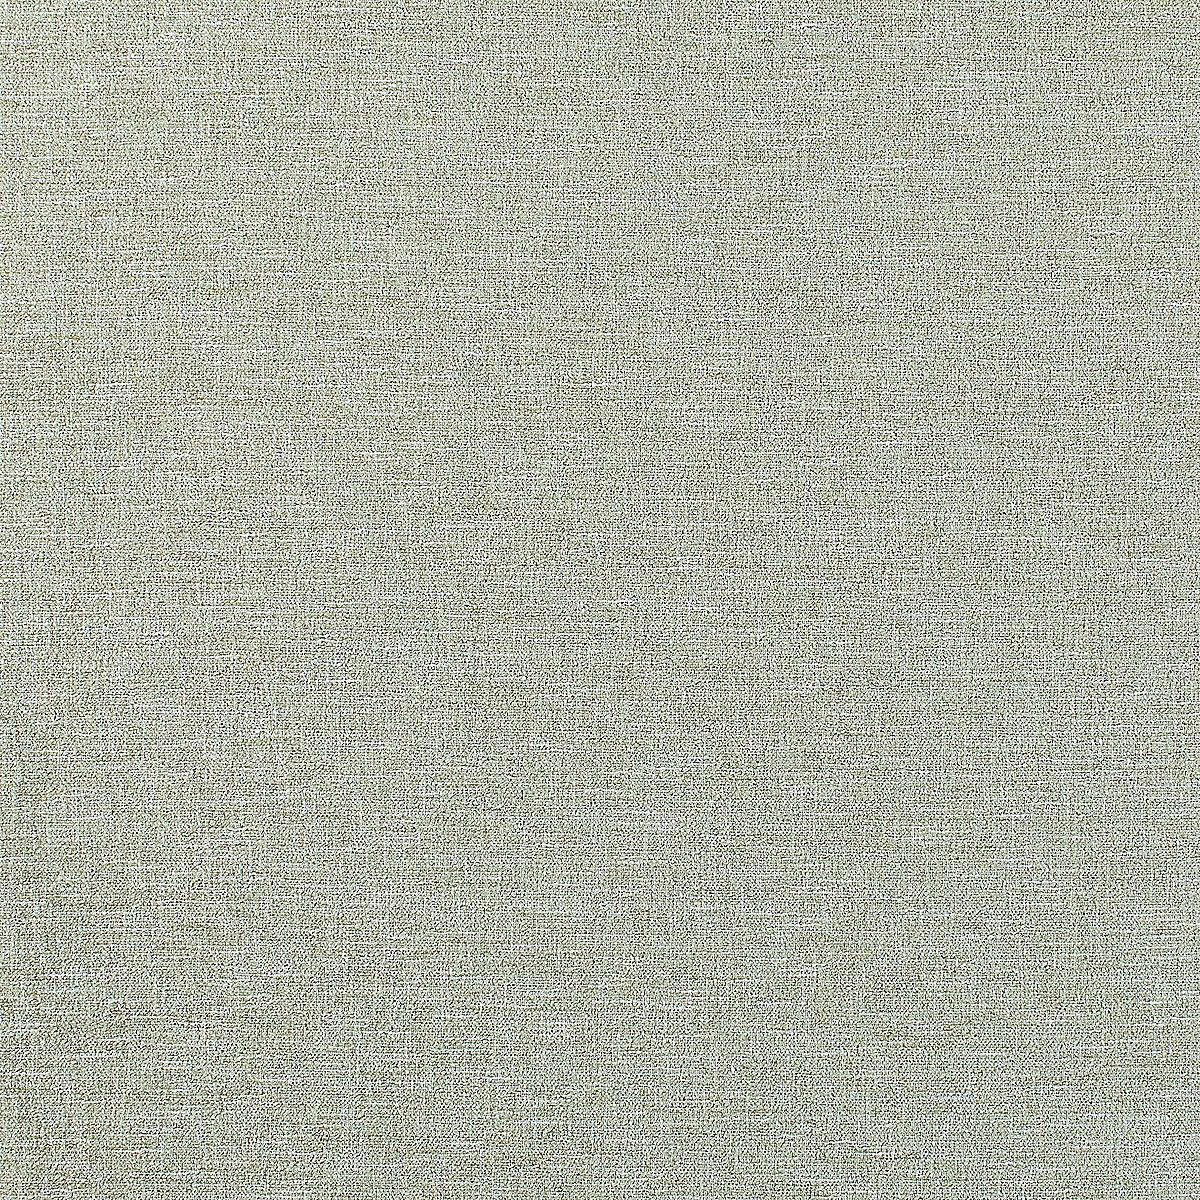 Haven: Pear (fabric yardage)